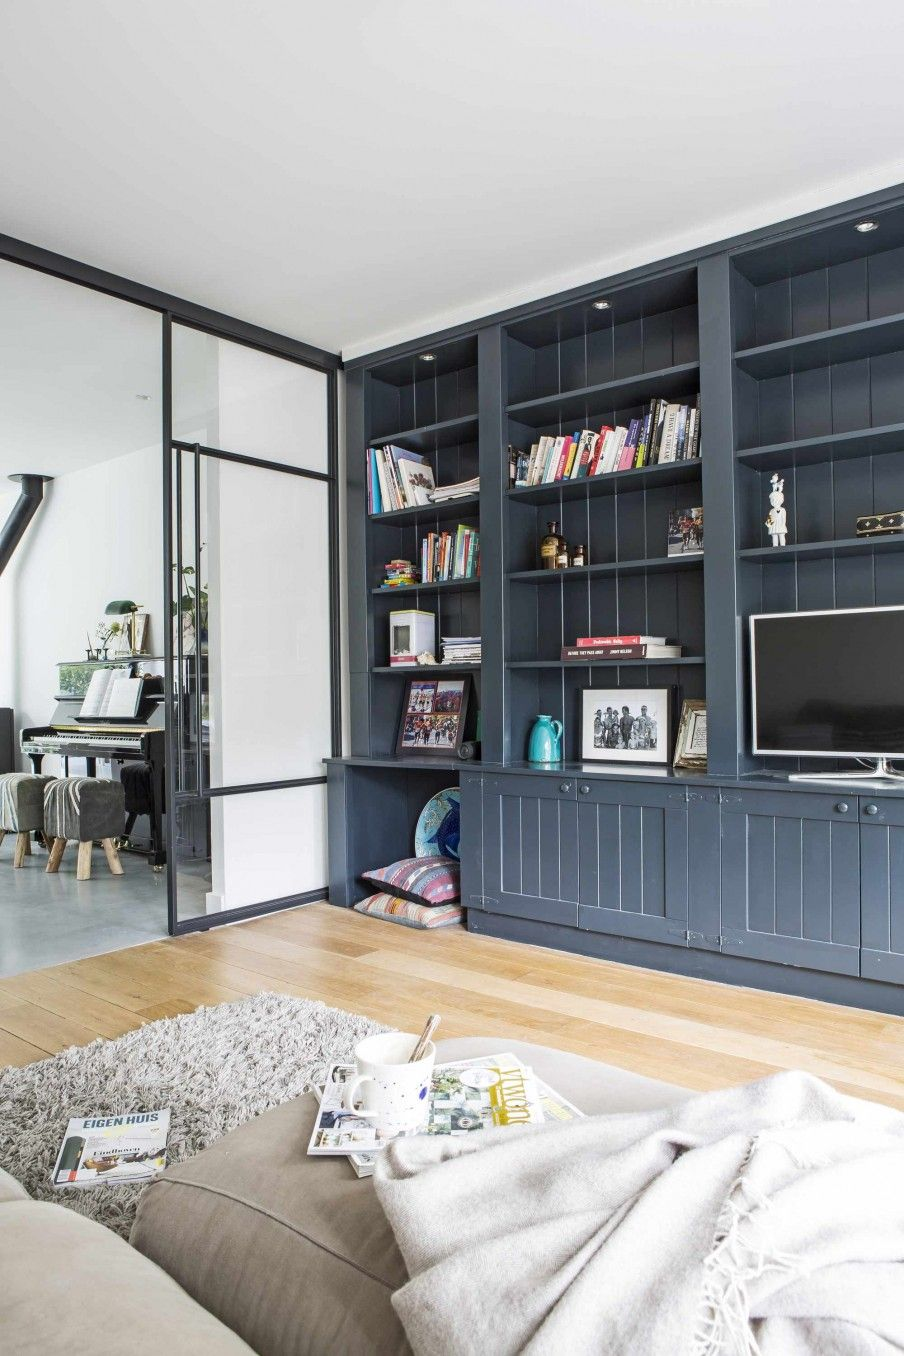 woonkamer met houten vloer en grote boekenkast living room with wooden floor and big bookcase